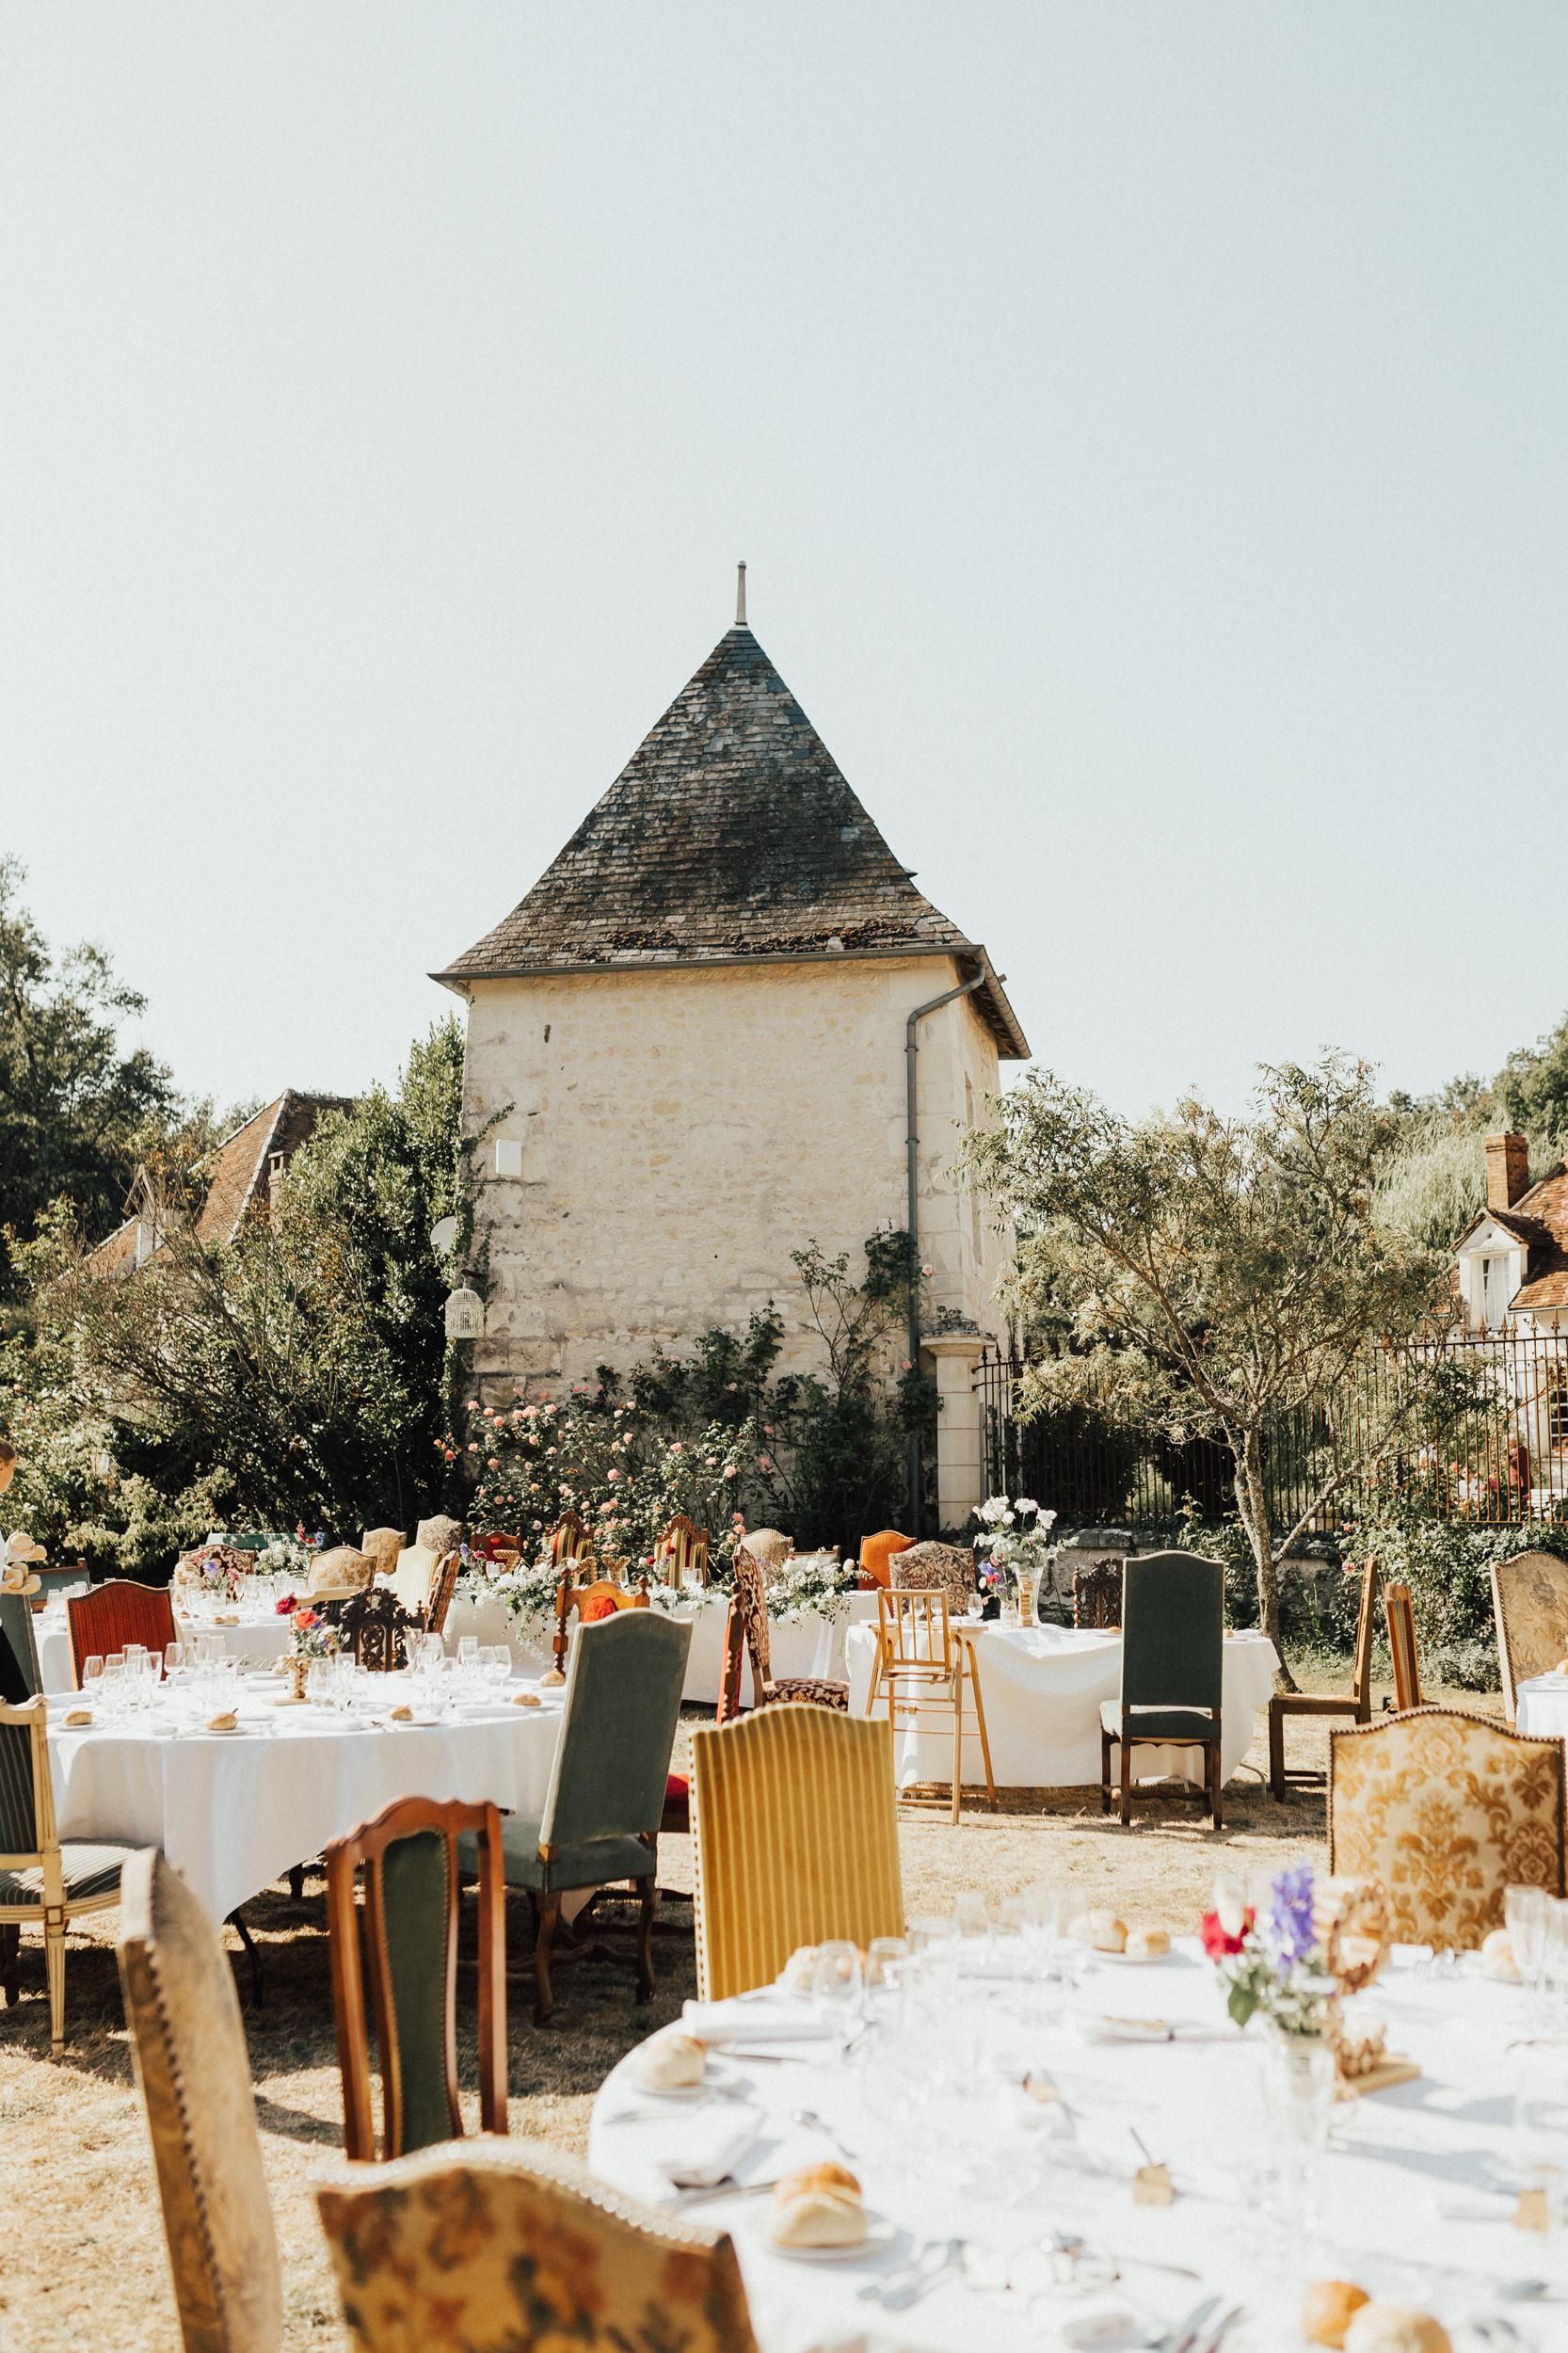 Amy-Zac-Destination-Wedding-France-Manoir-Foulquetiere-Darina-Stoda-Photography-60.jpg